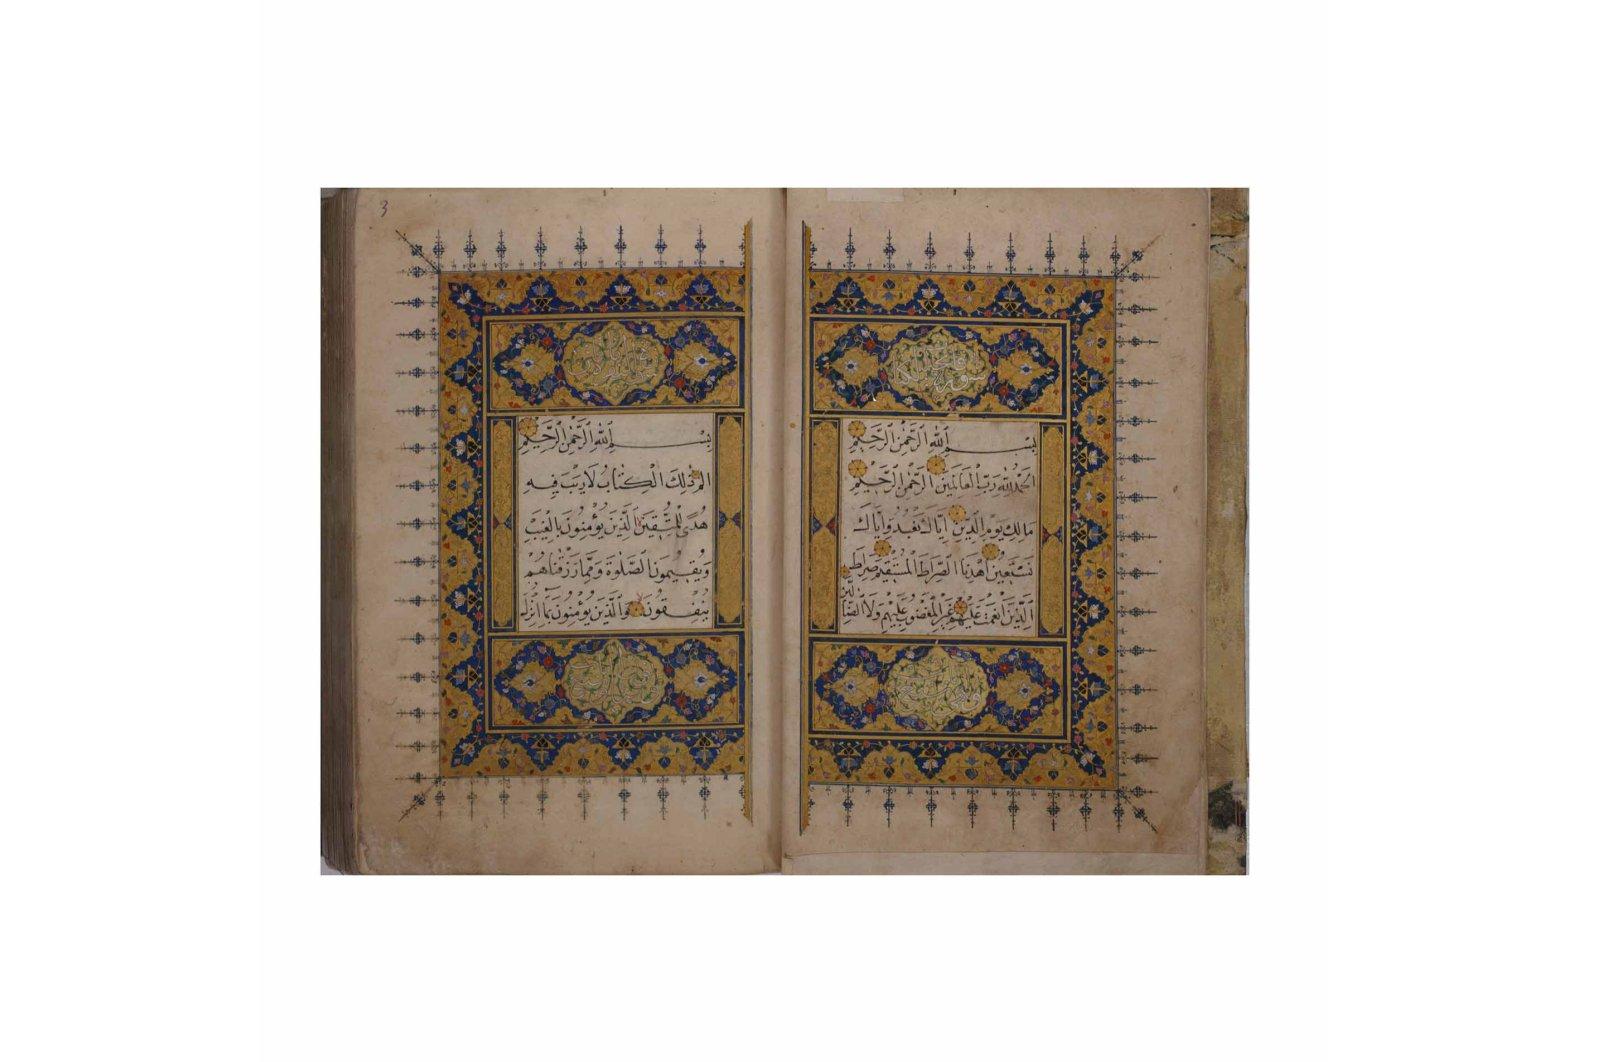 A Quran with muhaqqaq, naskh and rayhani scripts by Cemal Amasi, a contemporary calligrapher of Sheikh Hamdullah. (Courtesy of Sakıp Sabancı Museum)